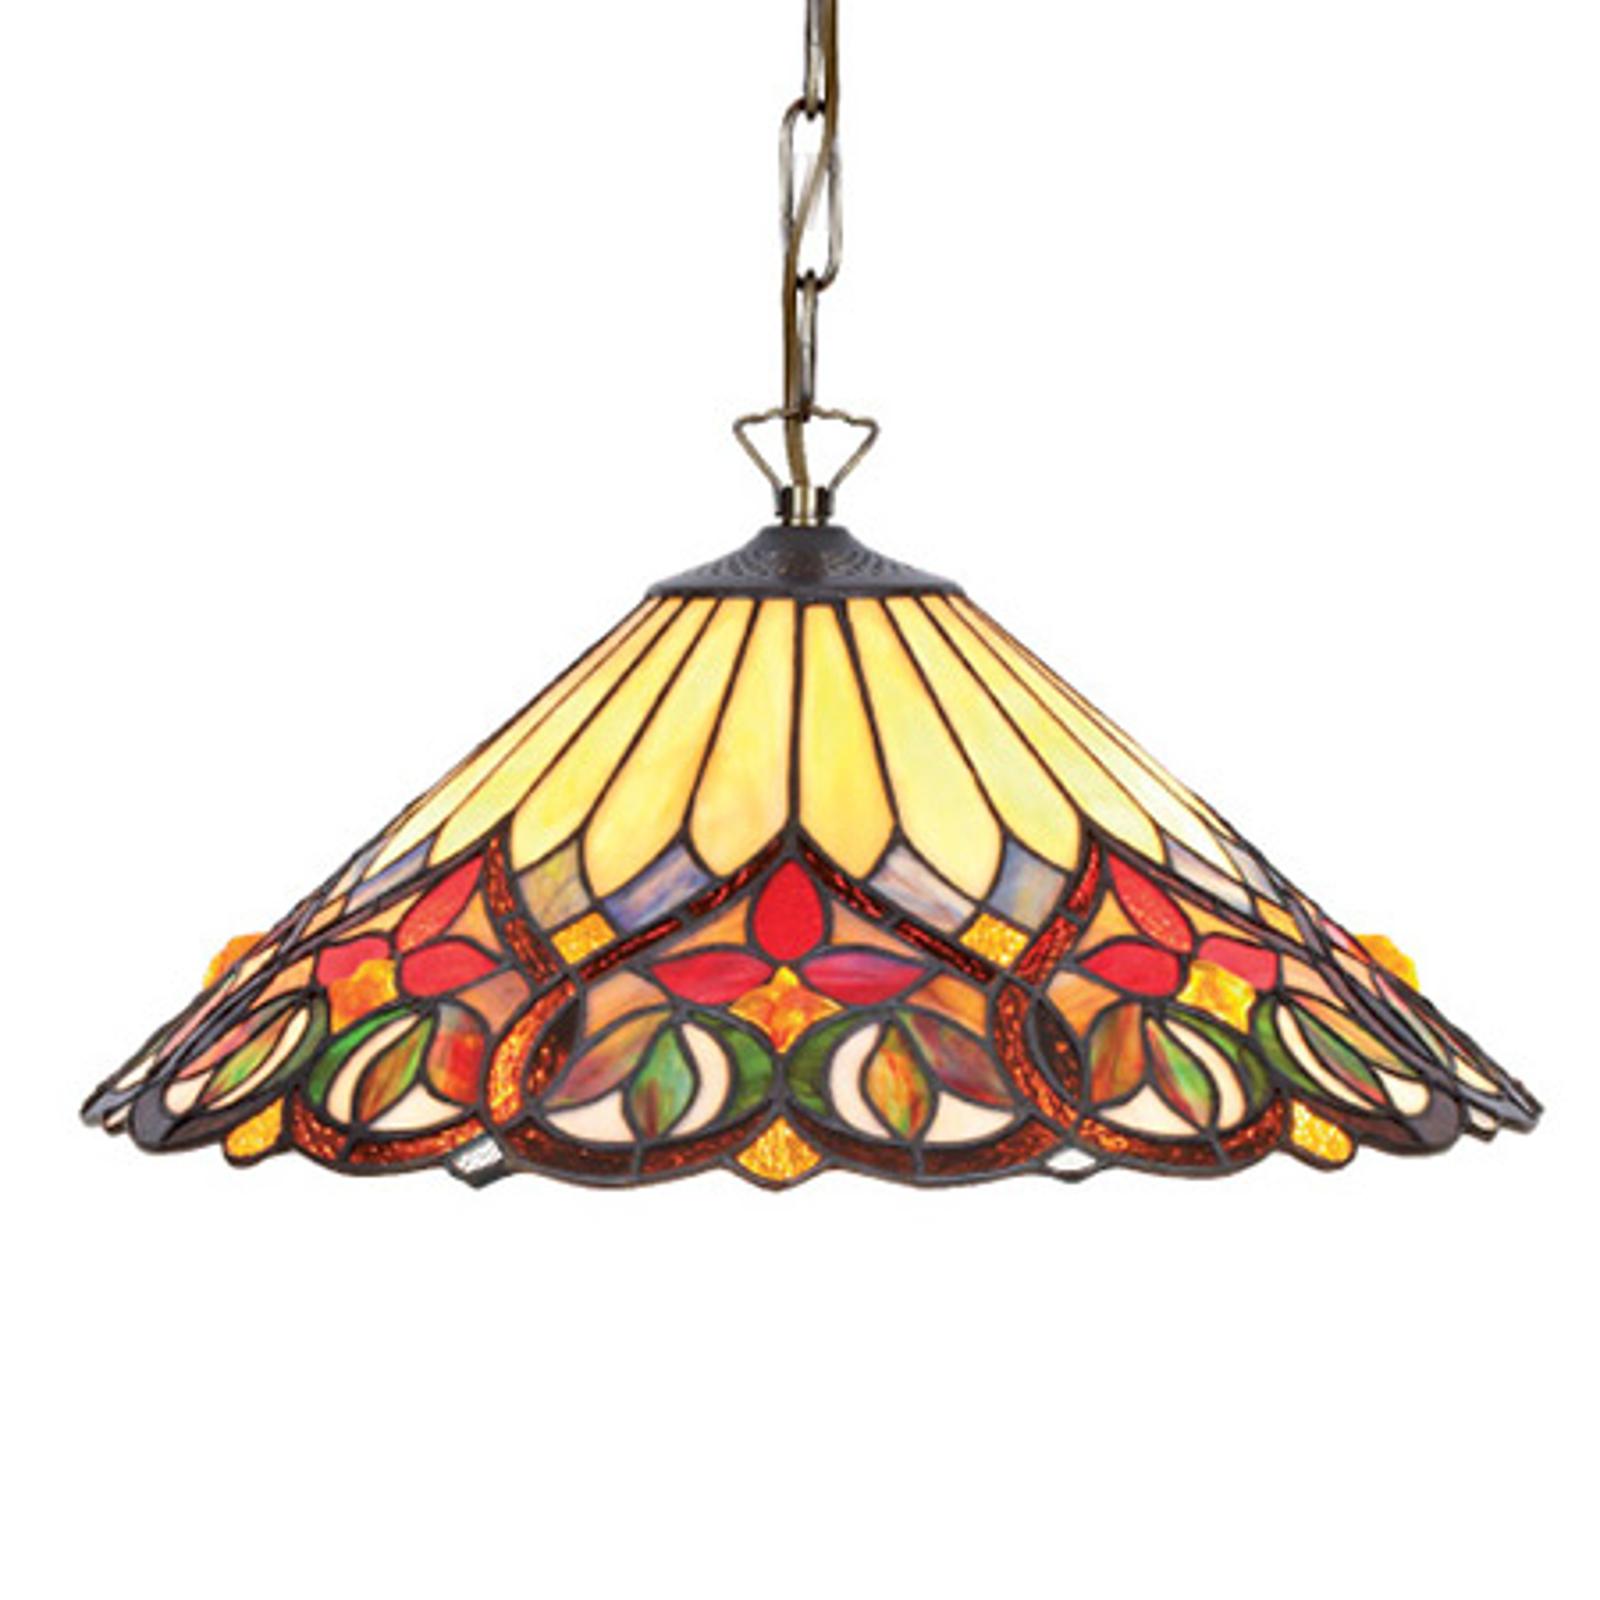 Závesná lampa Anni v štýle Tiffany_1032325_1